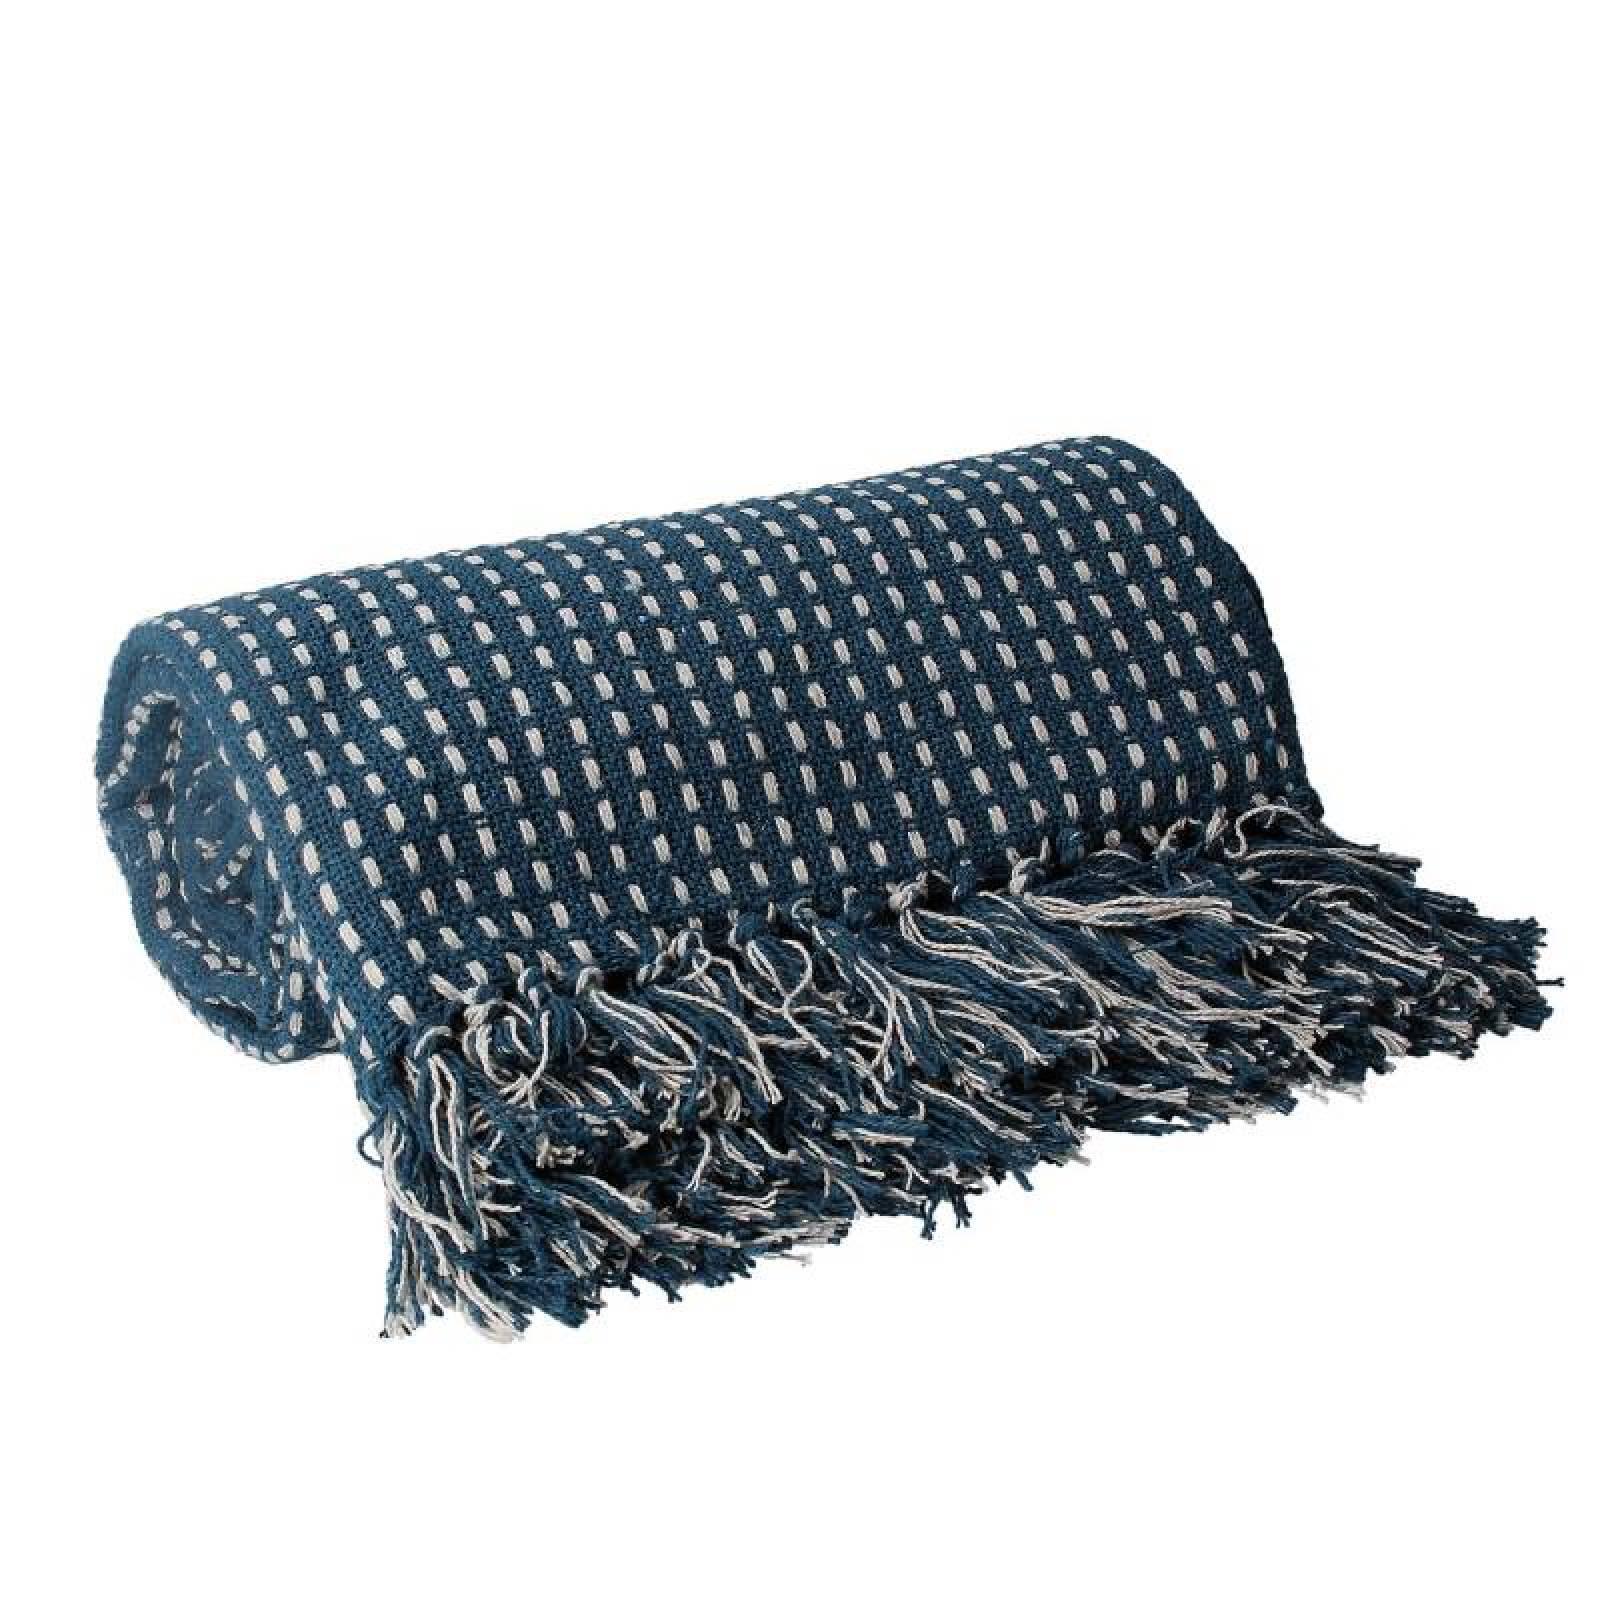 Stab Stitch Cotton Blanket In Teal